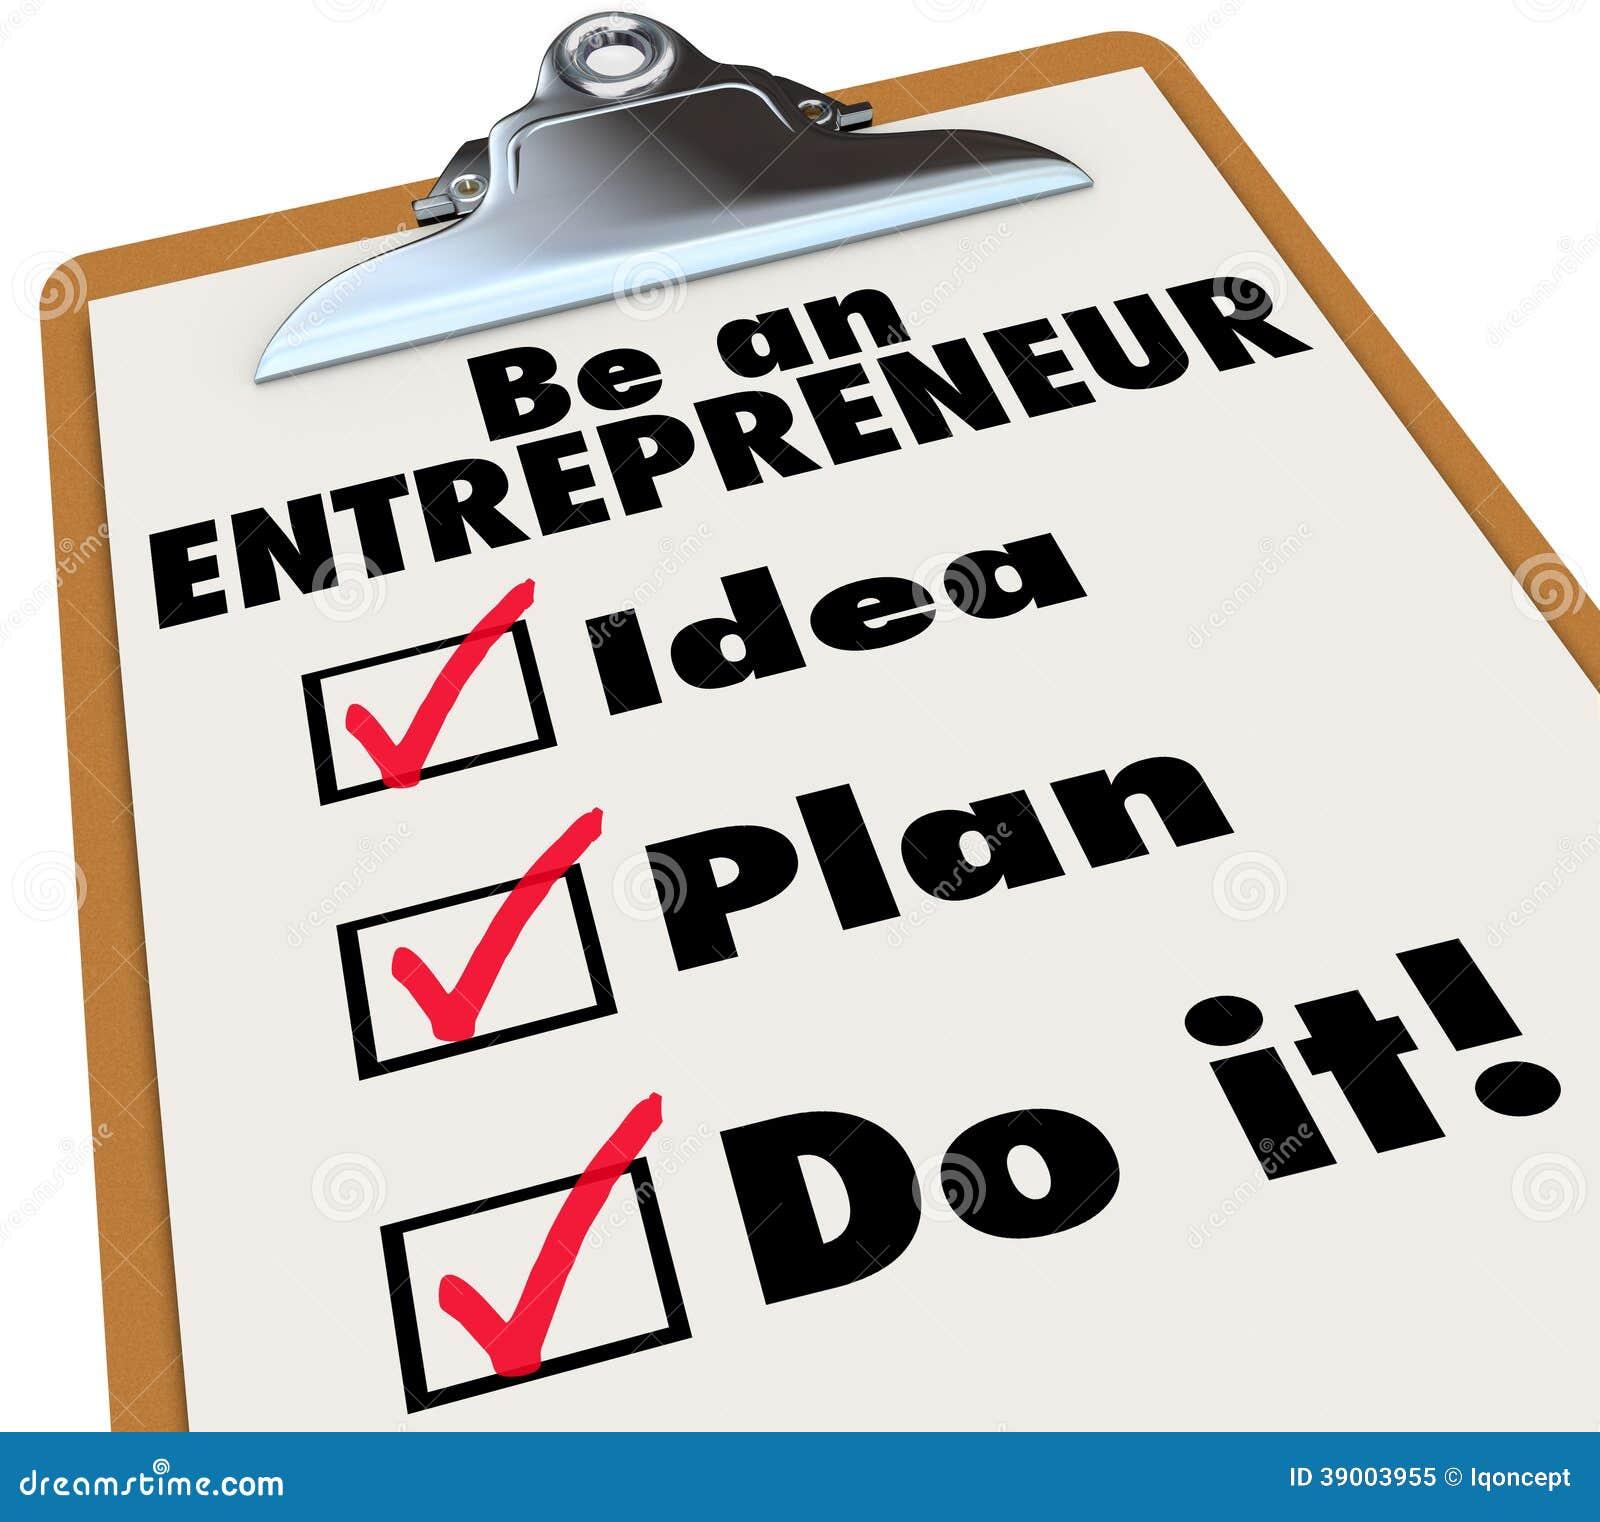 How can a business plan help an entrepreneur